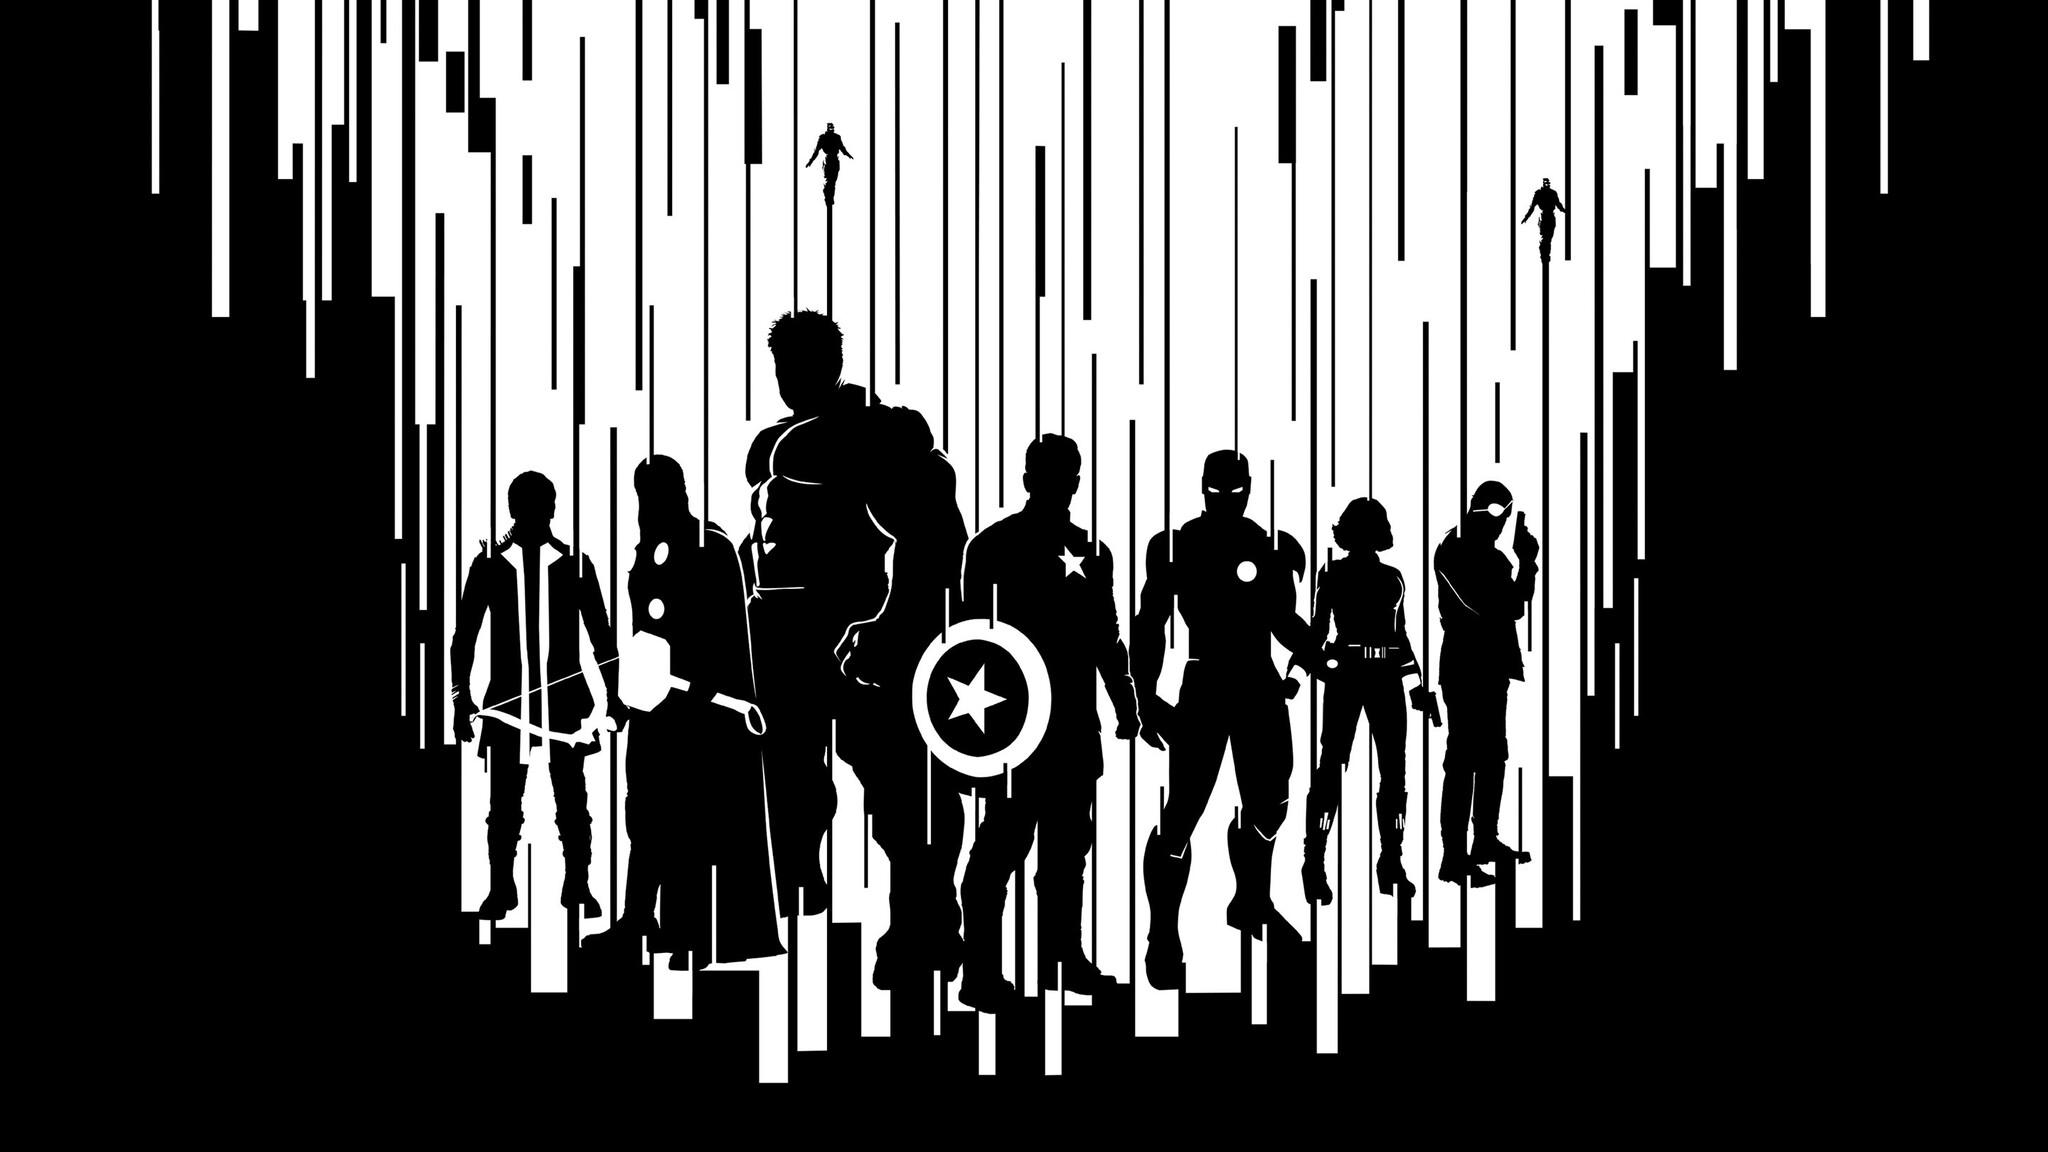 3d Thor Ragnarok Android Wallpaper 2048x1152 Avengers Age Of Ultron Artwork 2048x1152